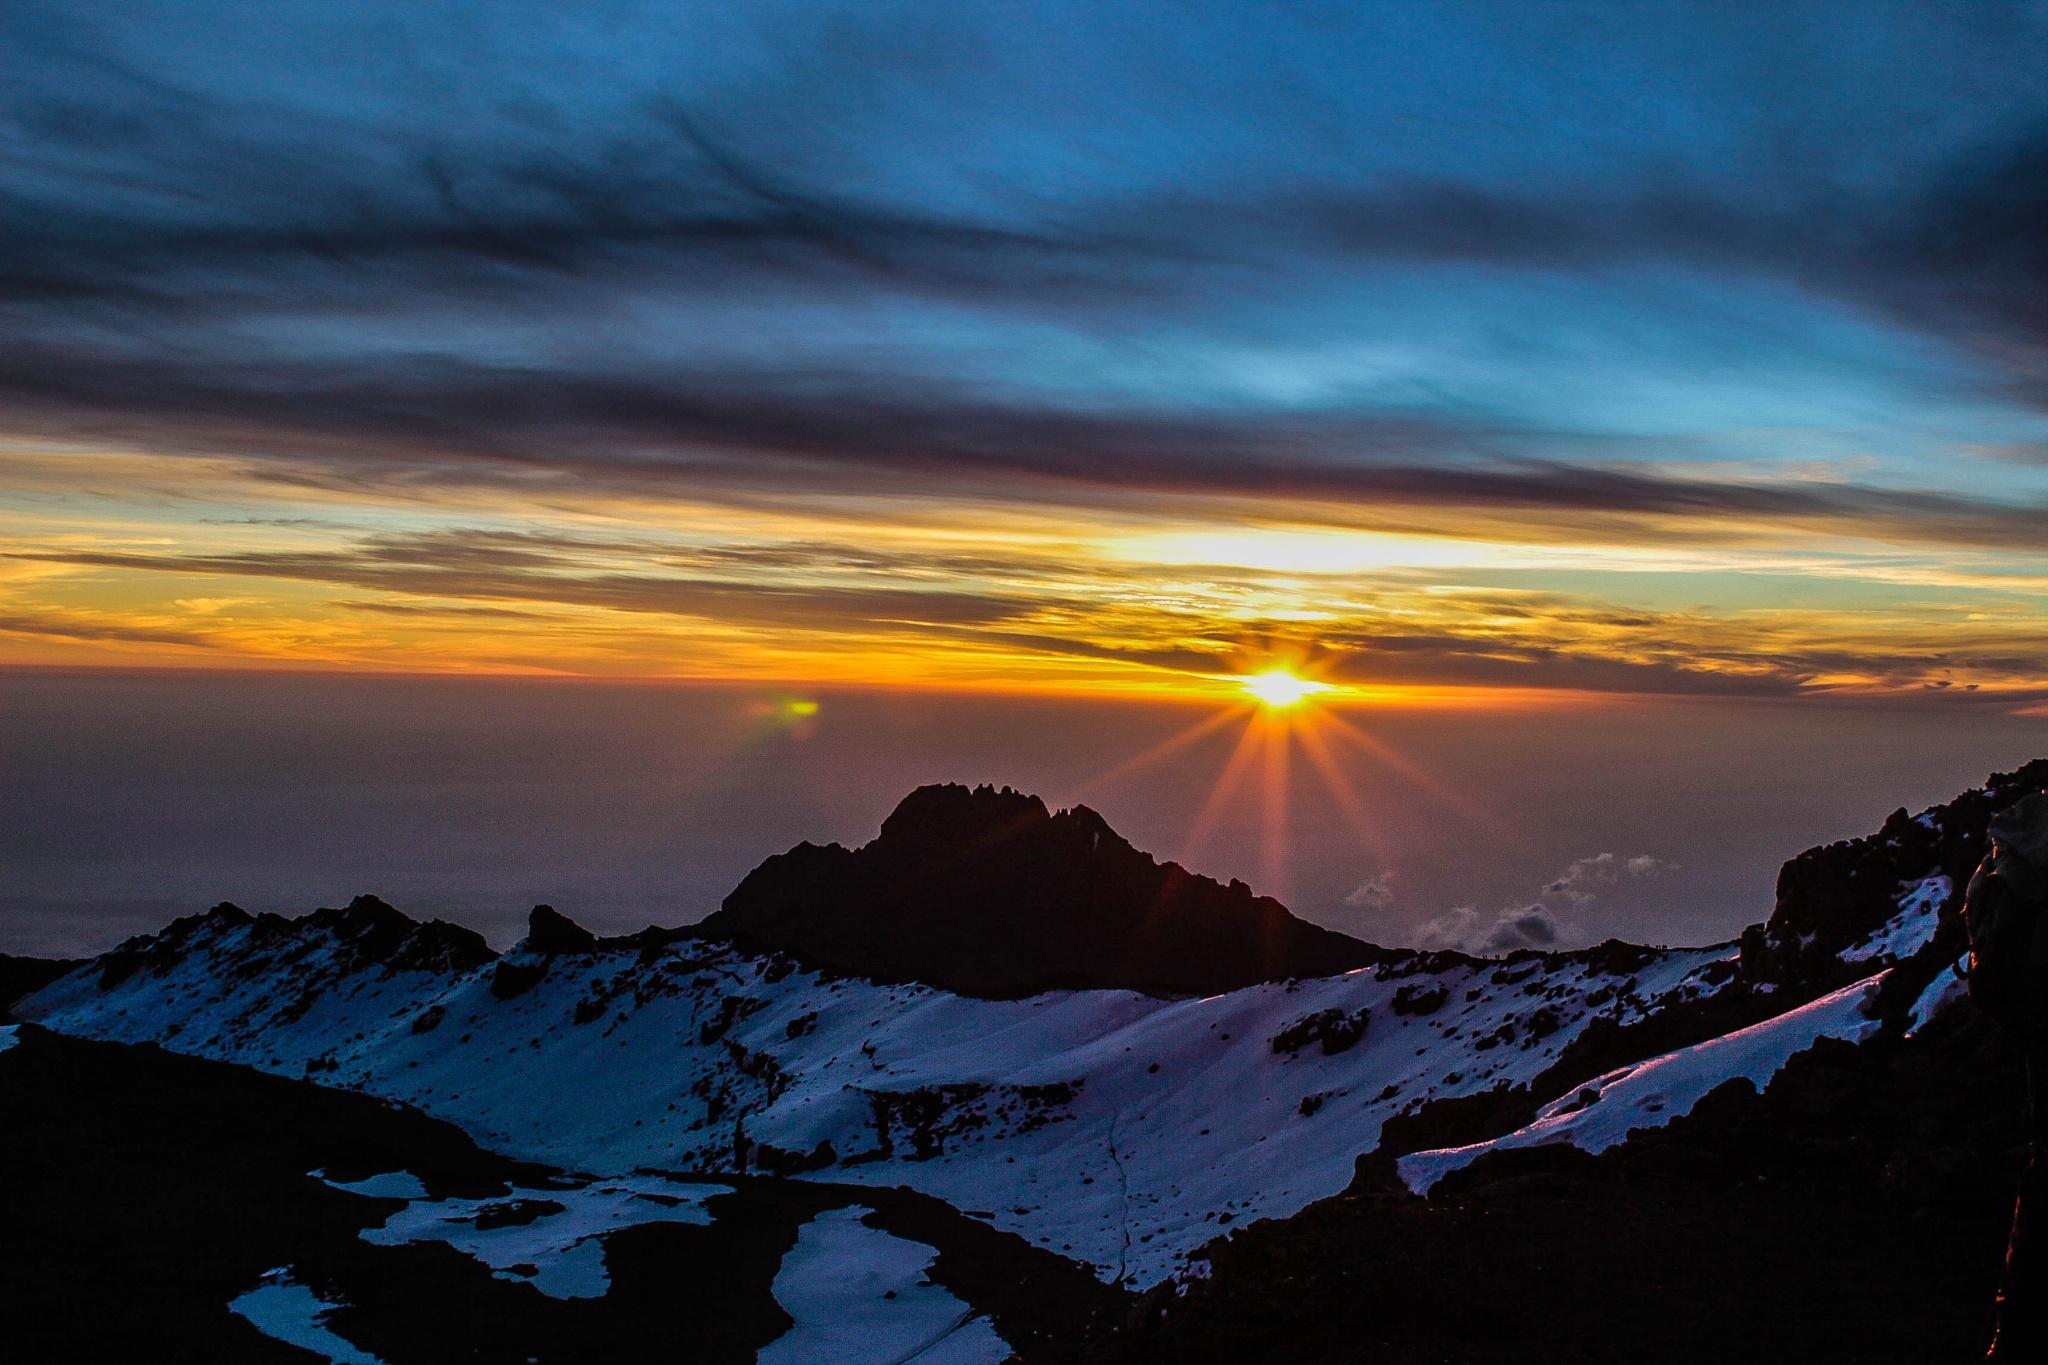 sunrise view from kilimanjaro peak  by ashish